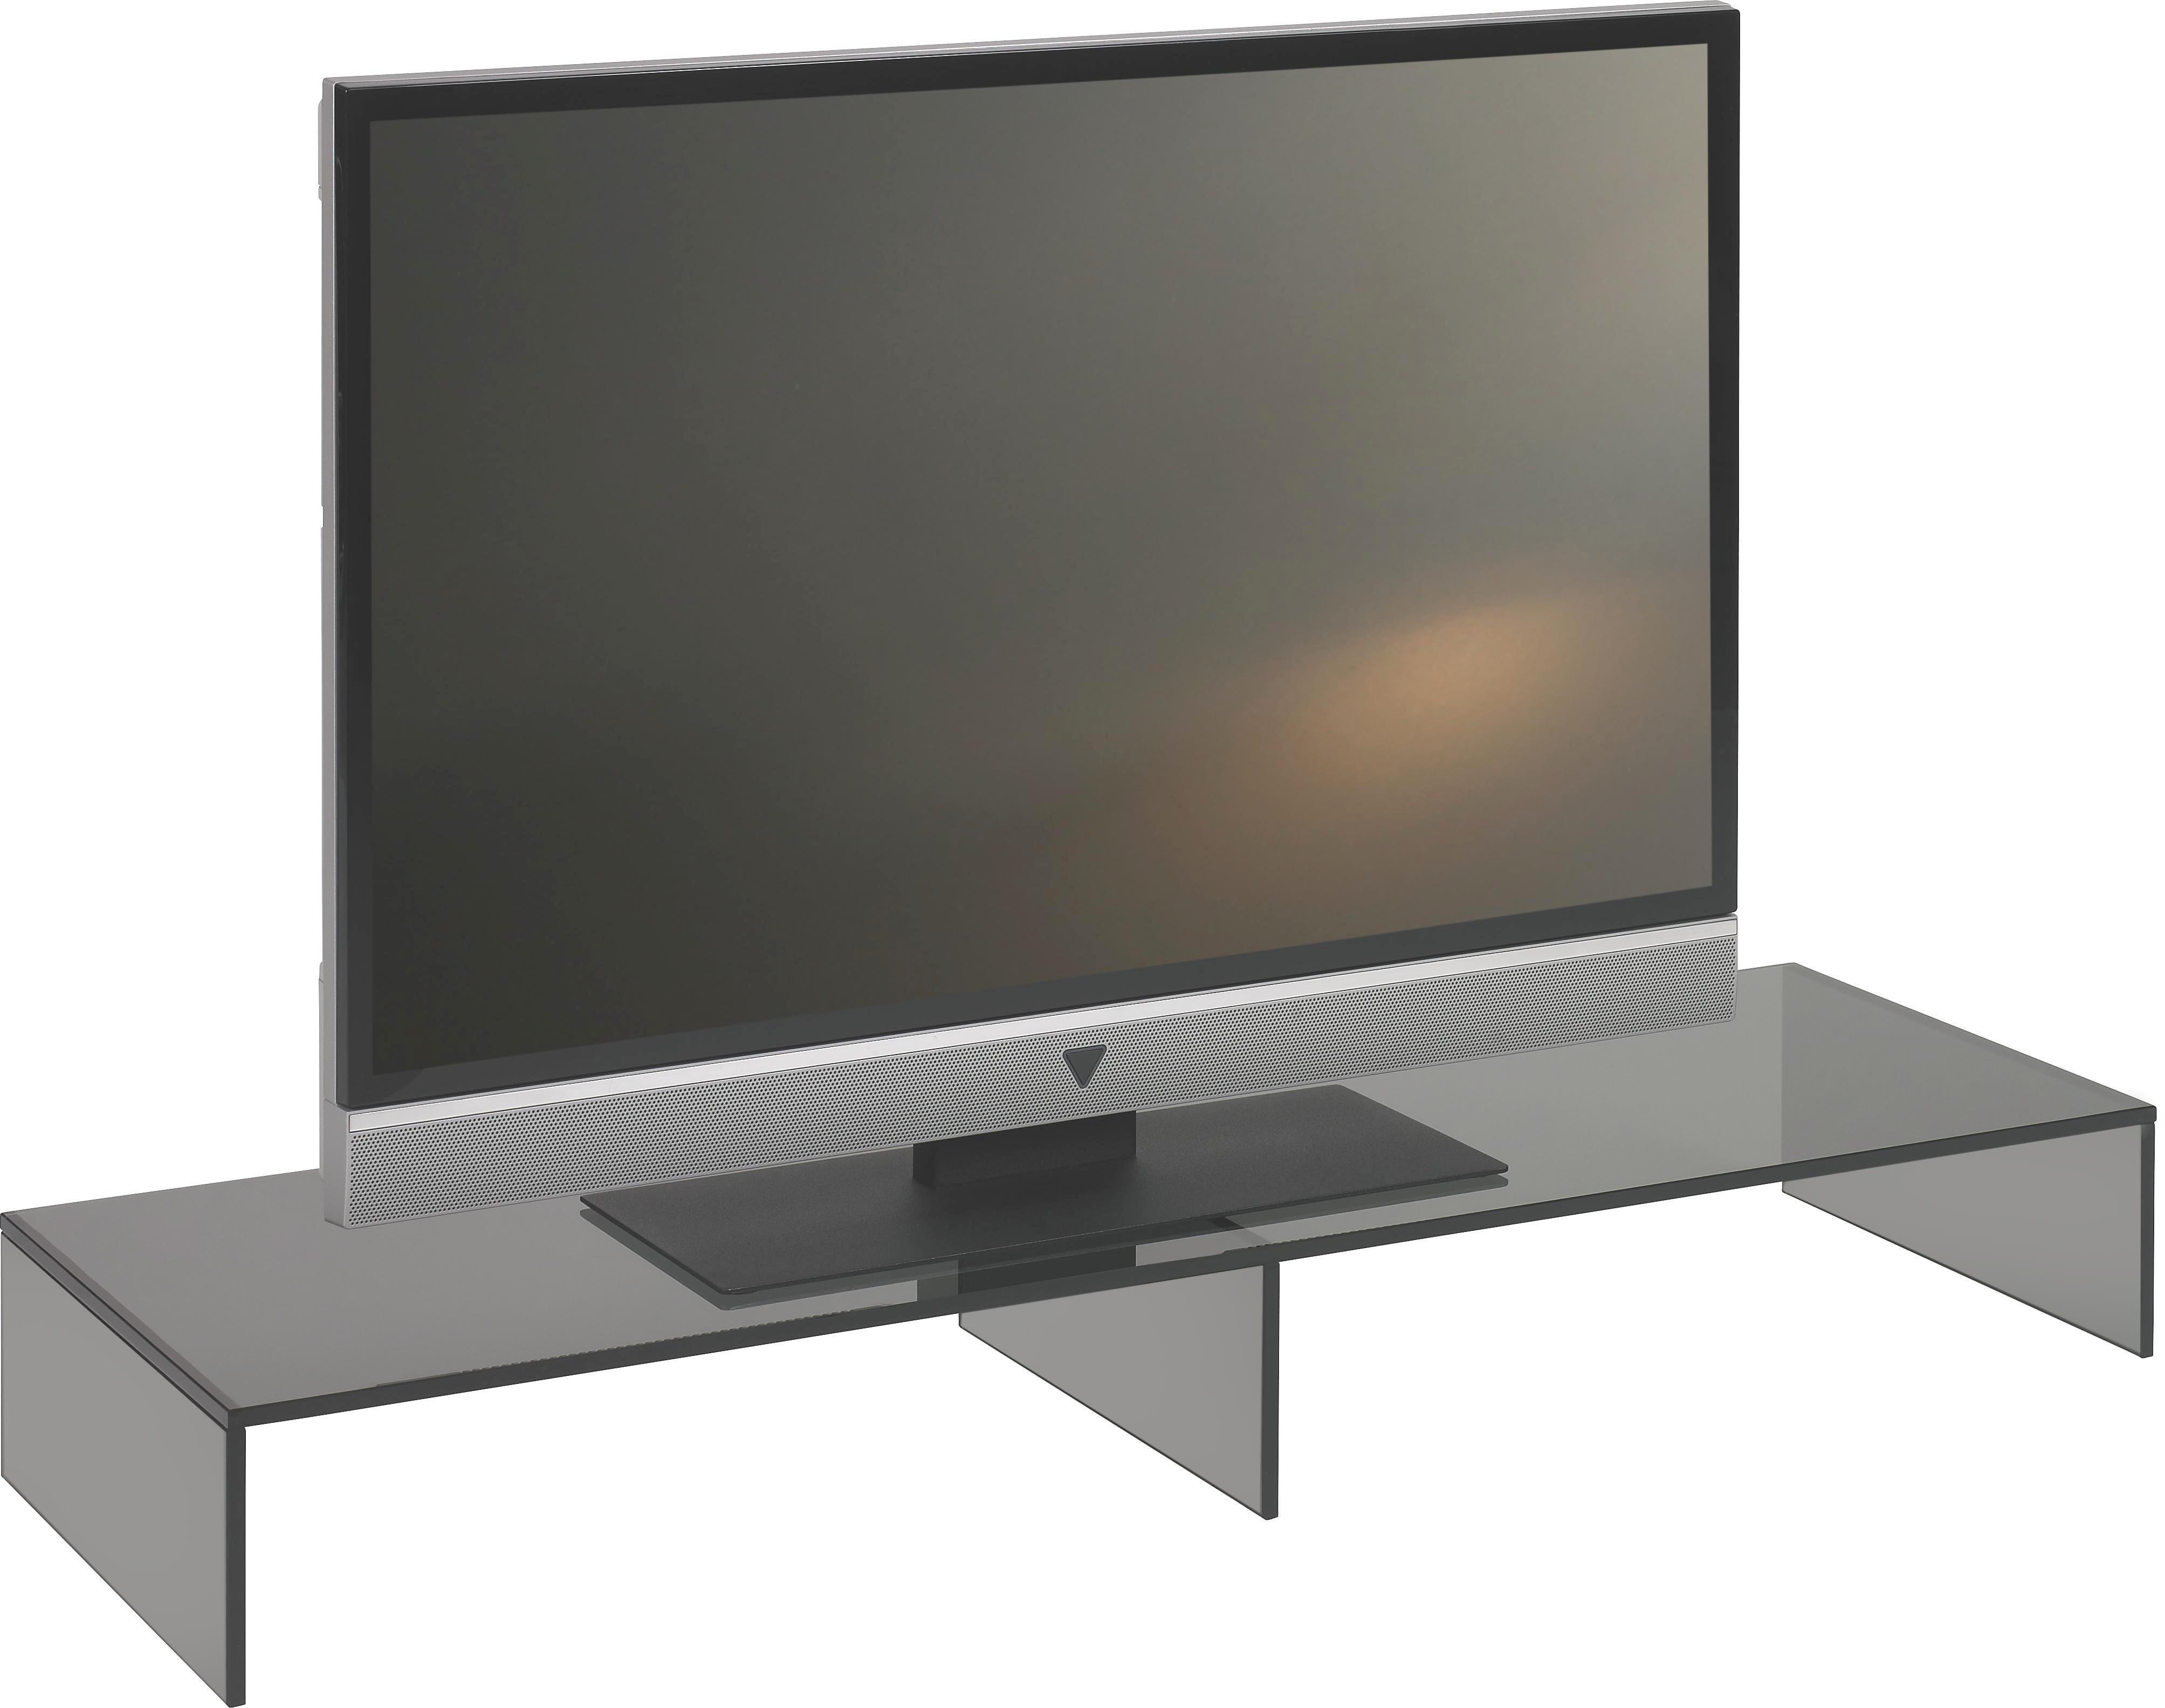 tv lowboard design holz hochglanz amera, tv bnk 100 cm. gallery of tecnos lowboard asia breite cm with tv bnk, Design ideen